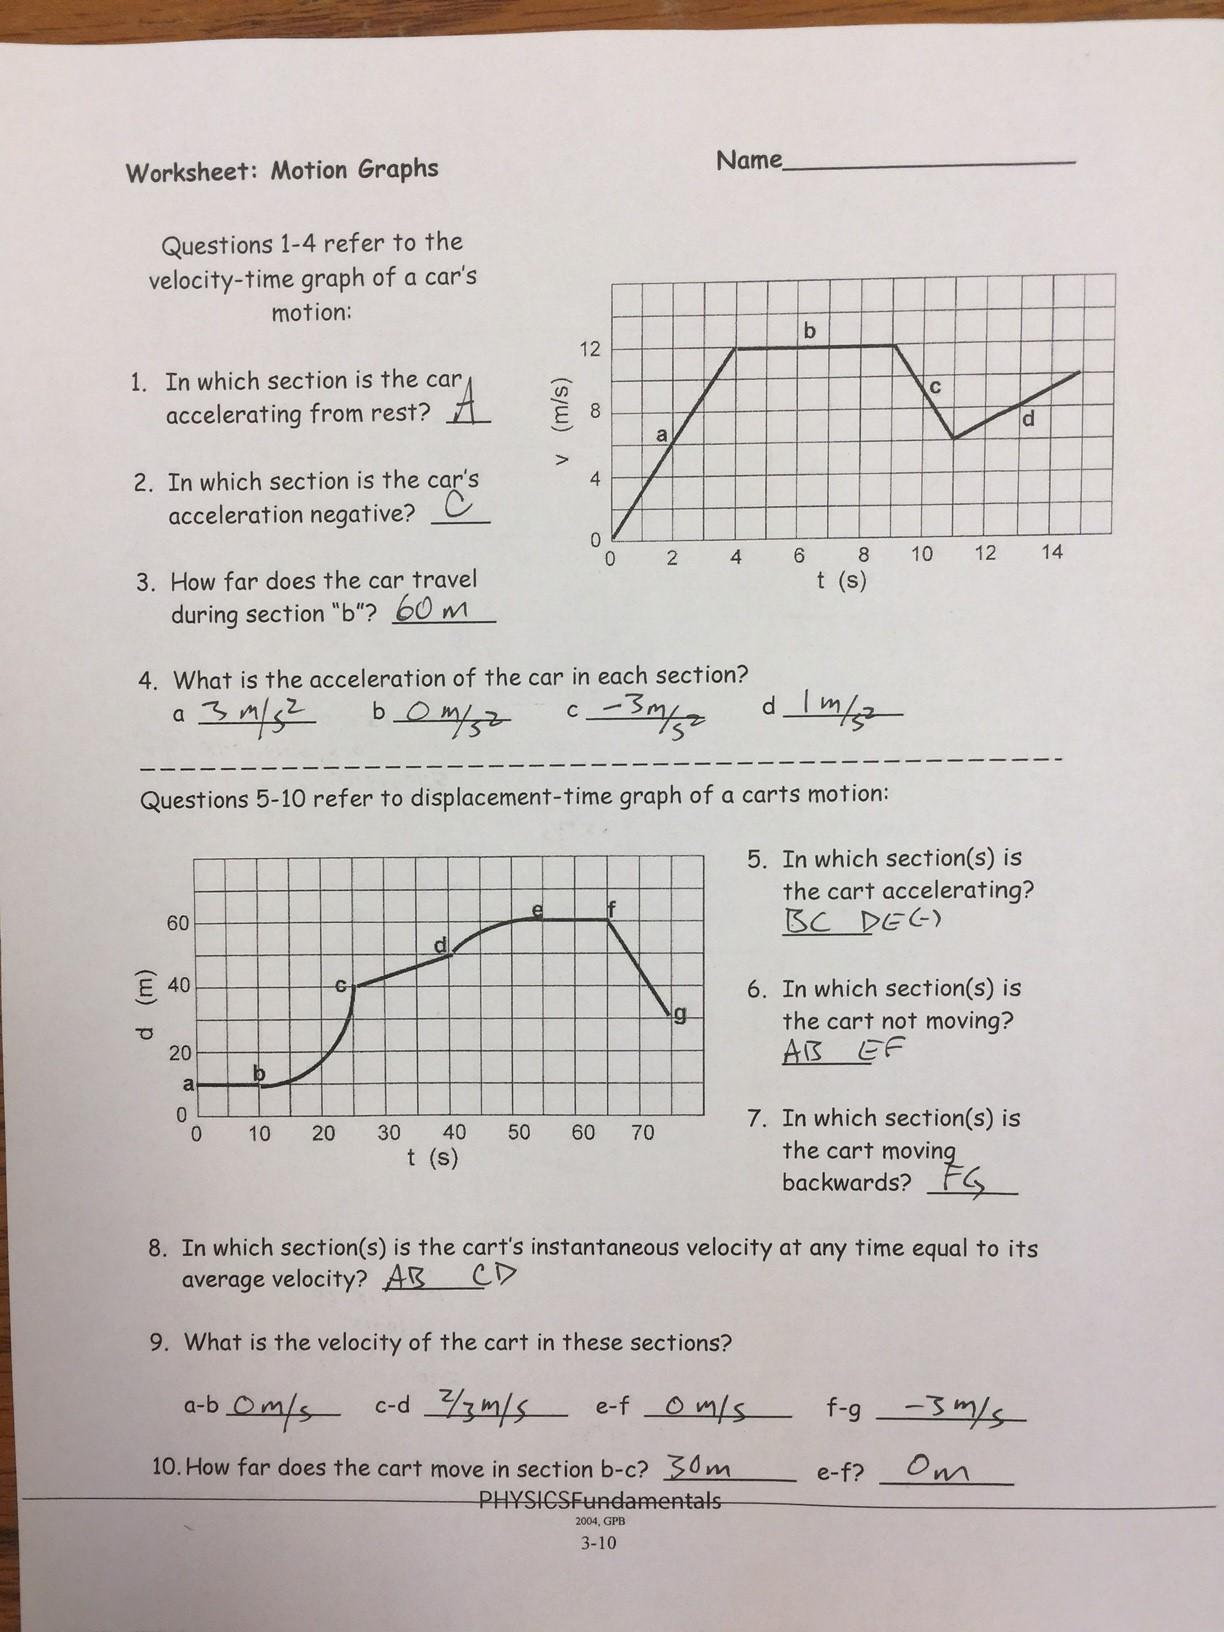 motion graph answers 1 coachhahs